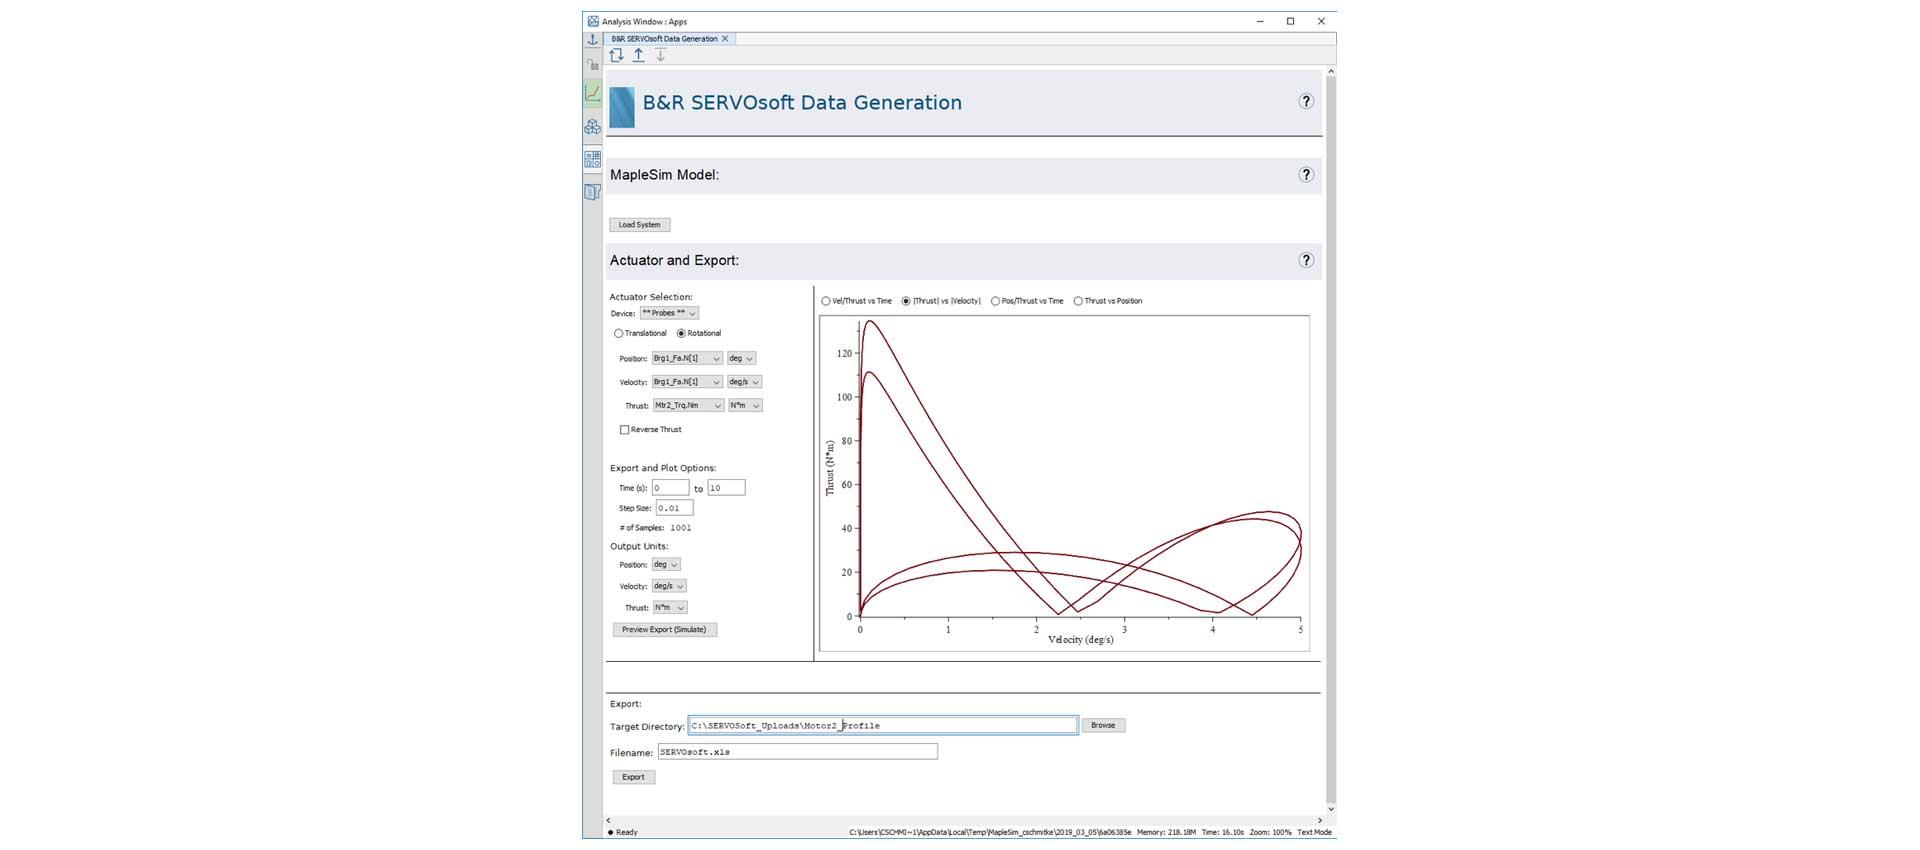 B&R SERVOSoft Data Generation App.